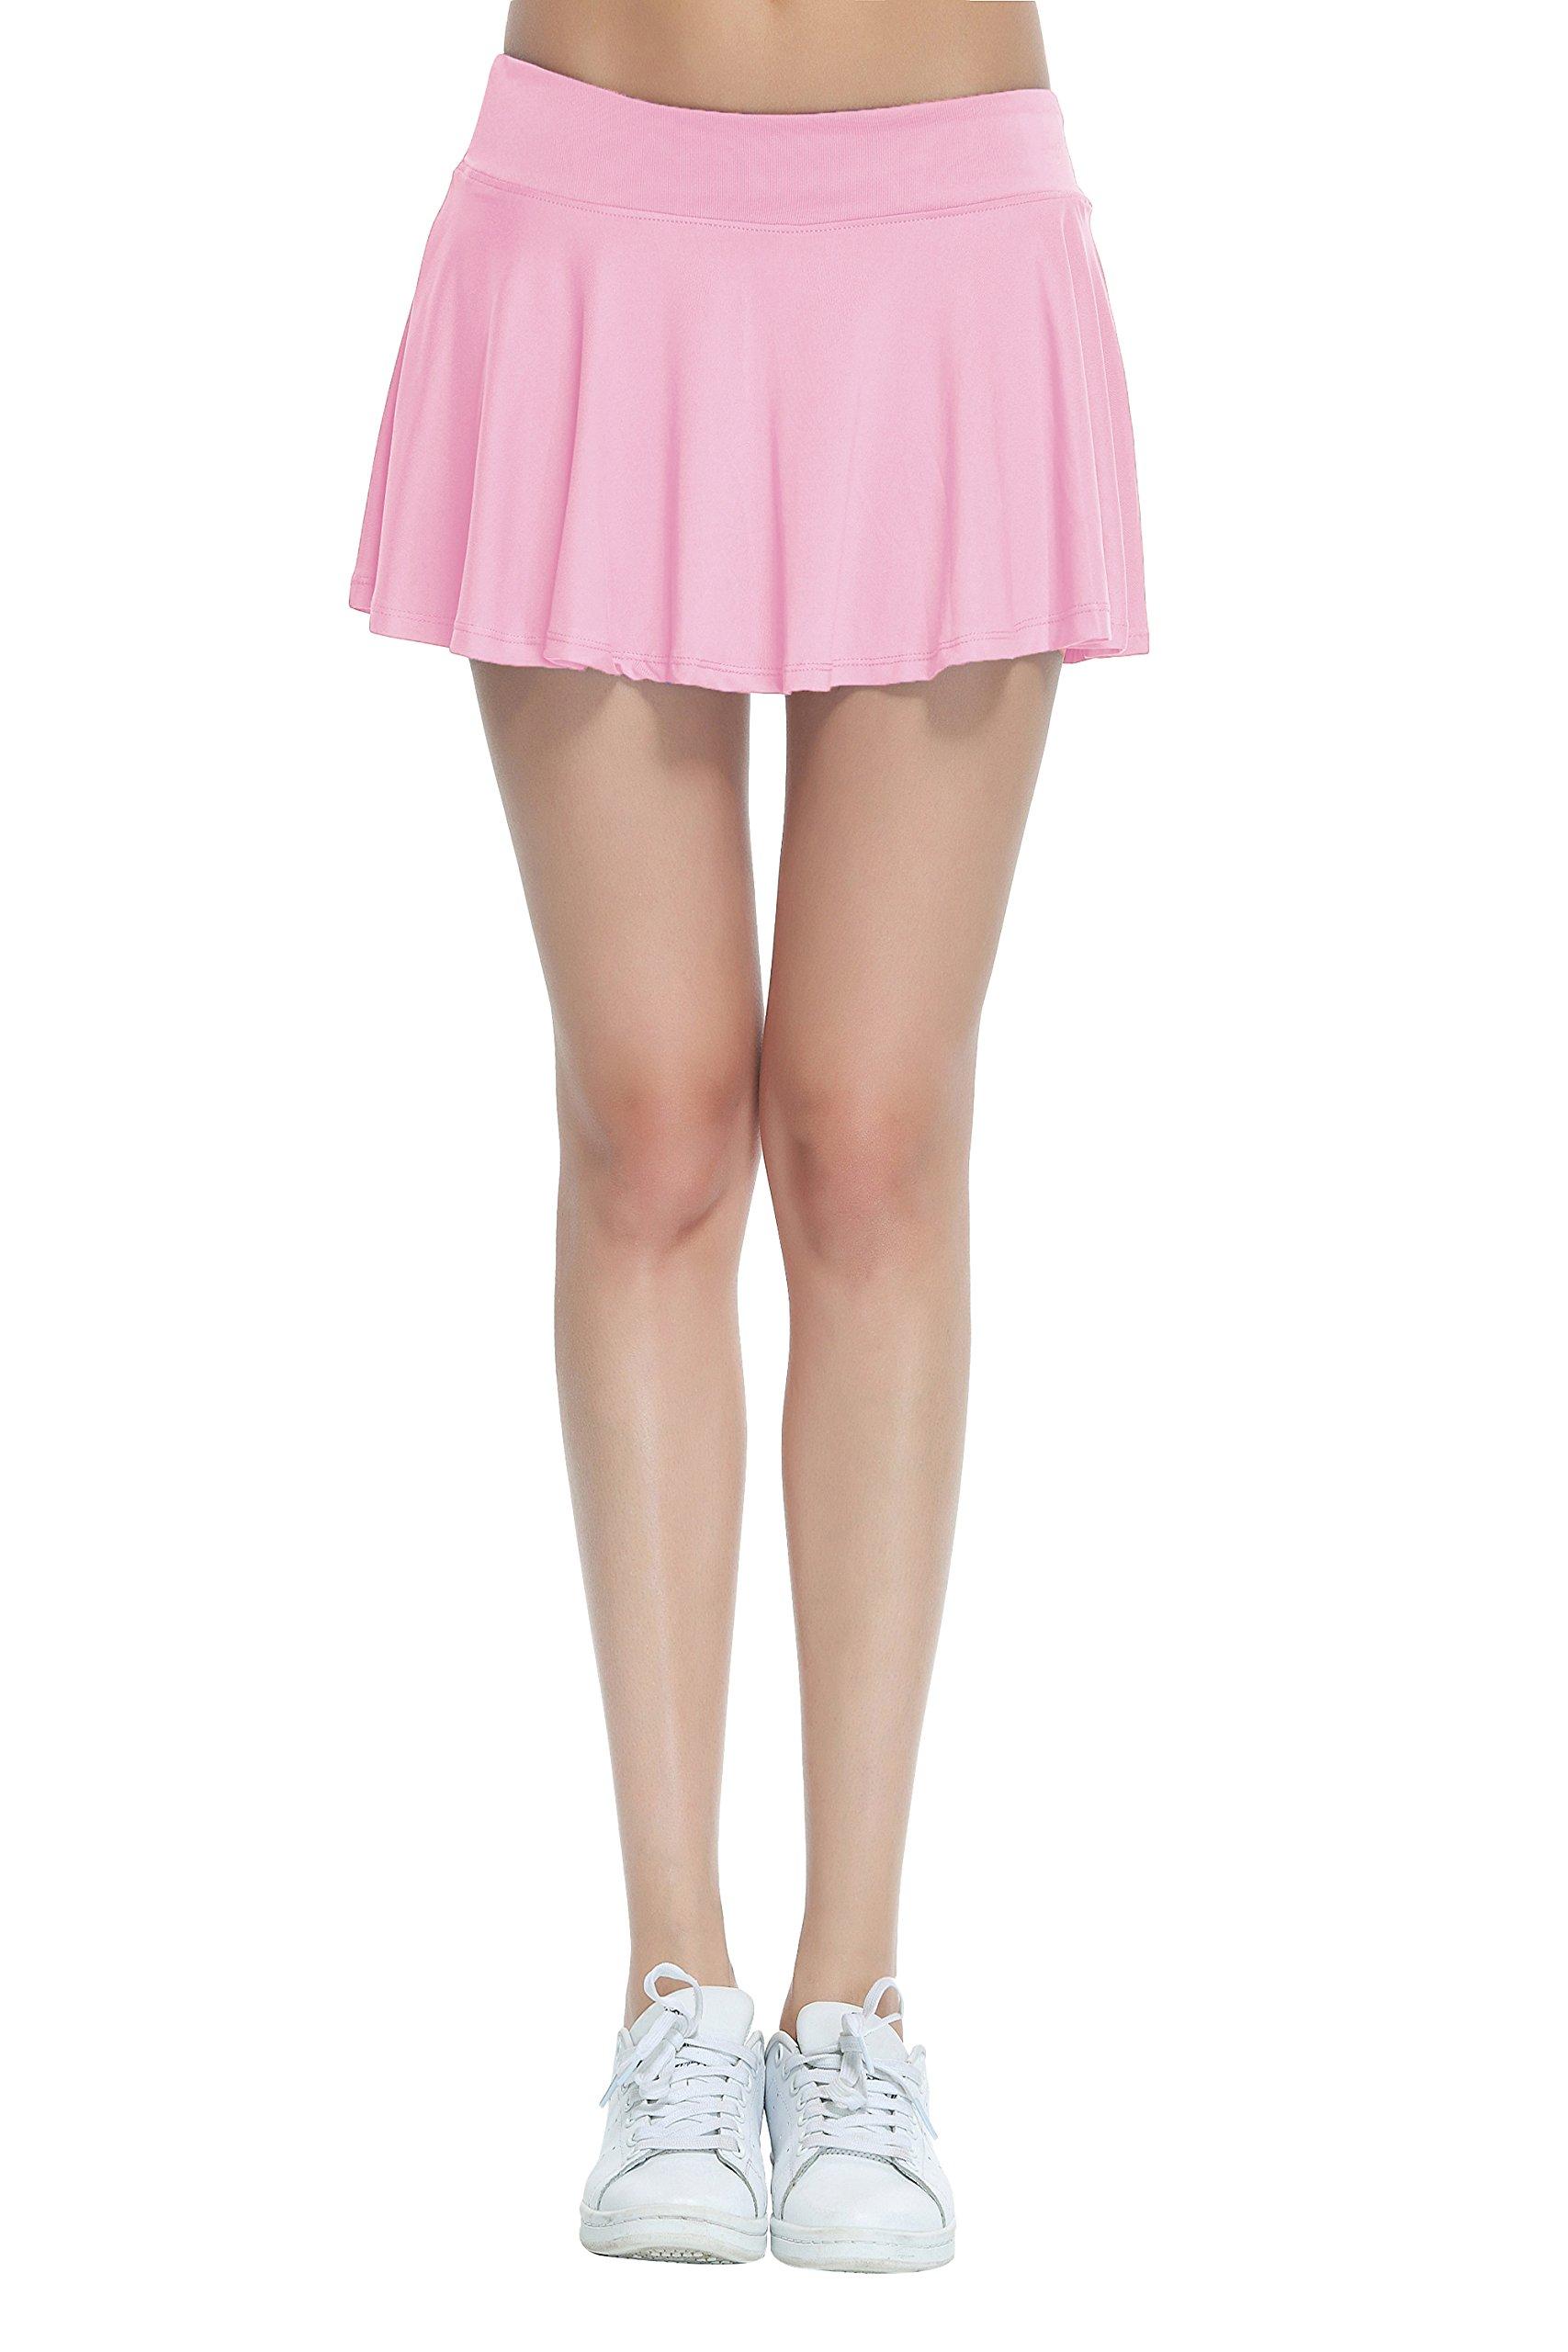 Honour Fashion Women's Gym Athleta Stretchy Skorts Underwear Covered (Light Pink, Small)